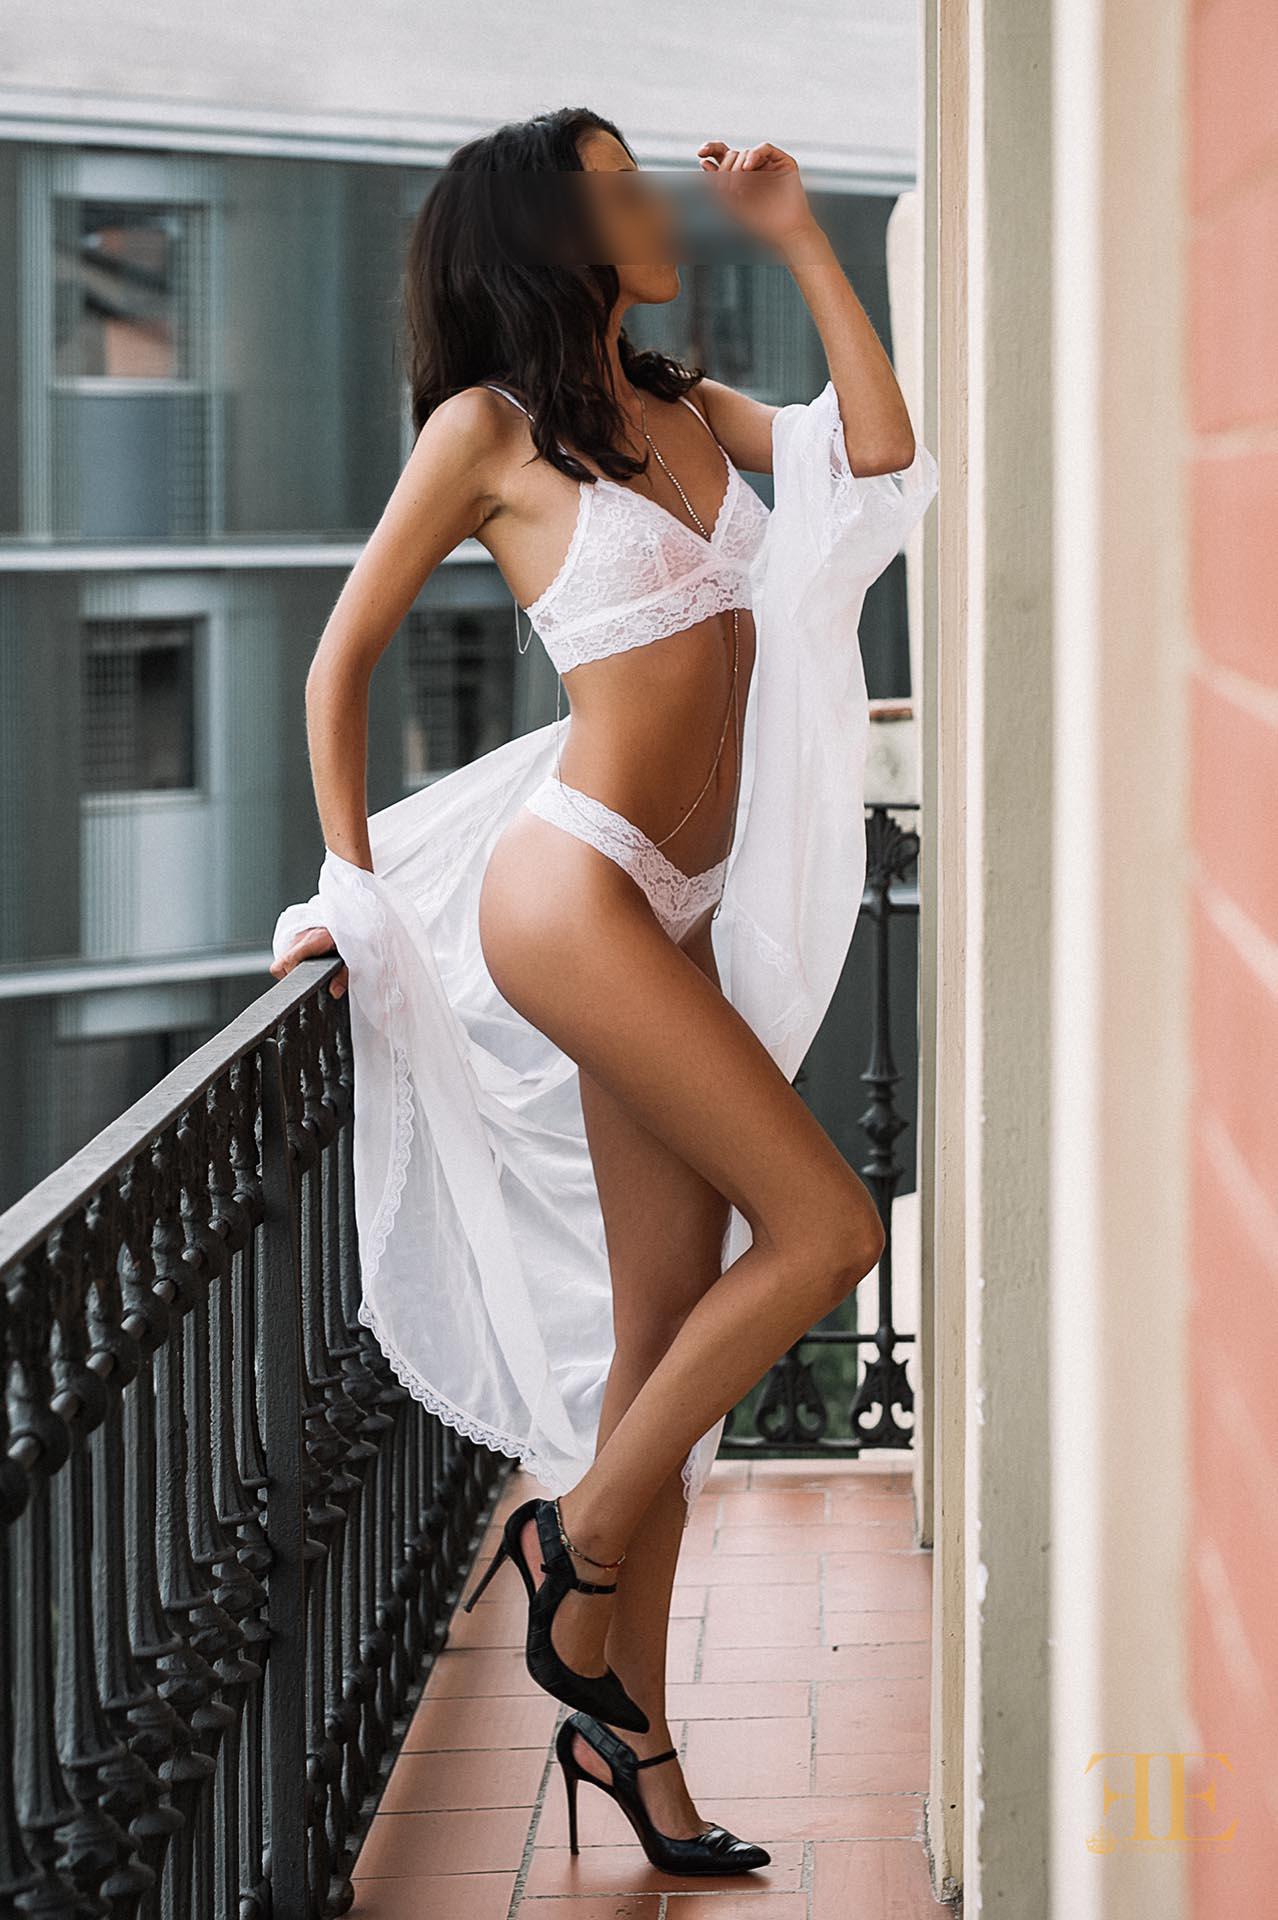 Fotógrafos para escorts. Books de fotos elegantes de escort